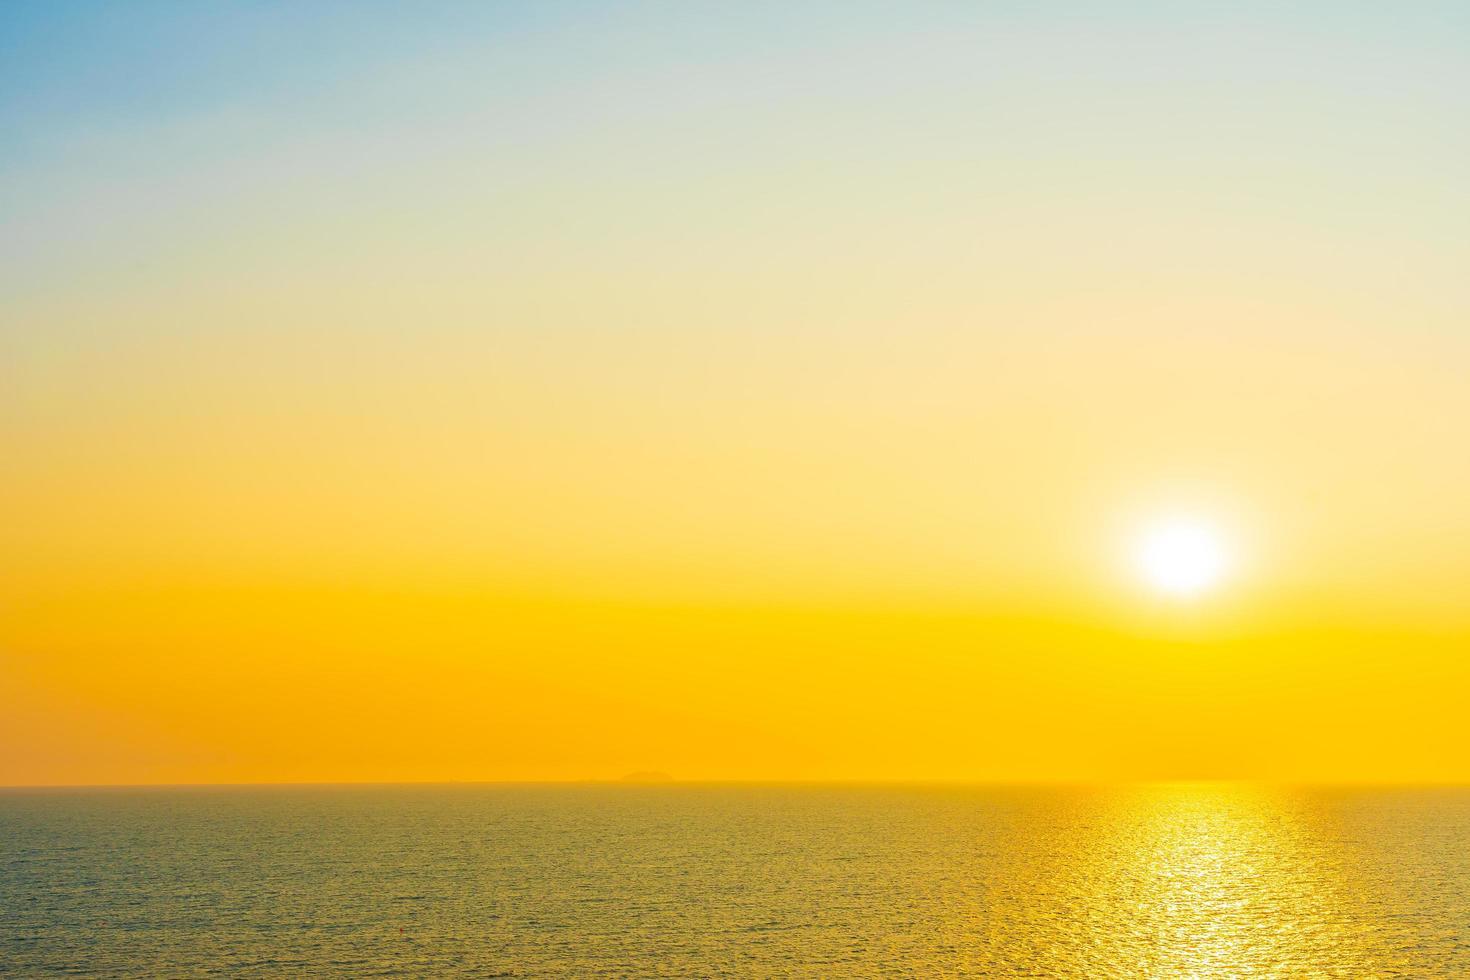 schöner Sonnenuntergang oder Sonnenaufgang am Meer foto